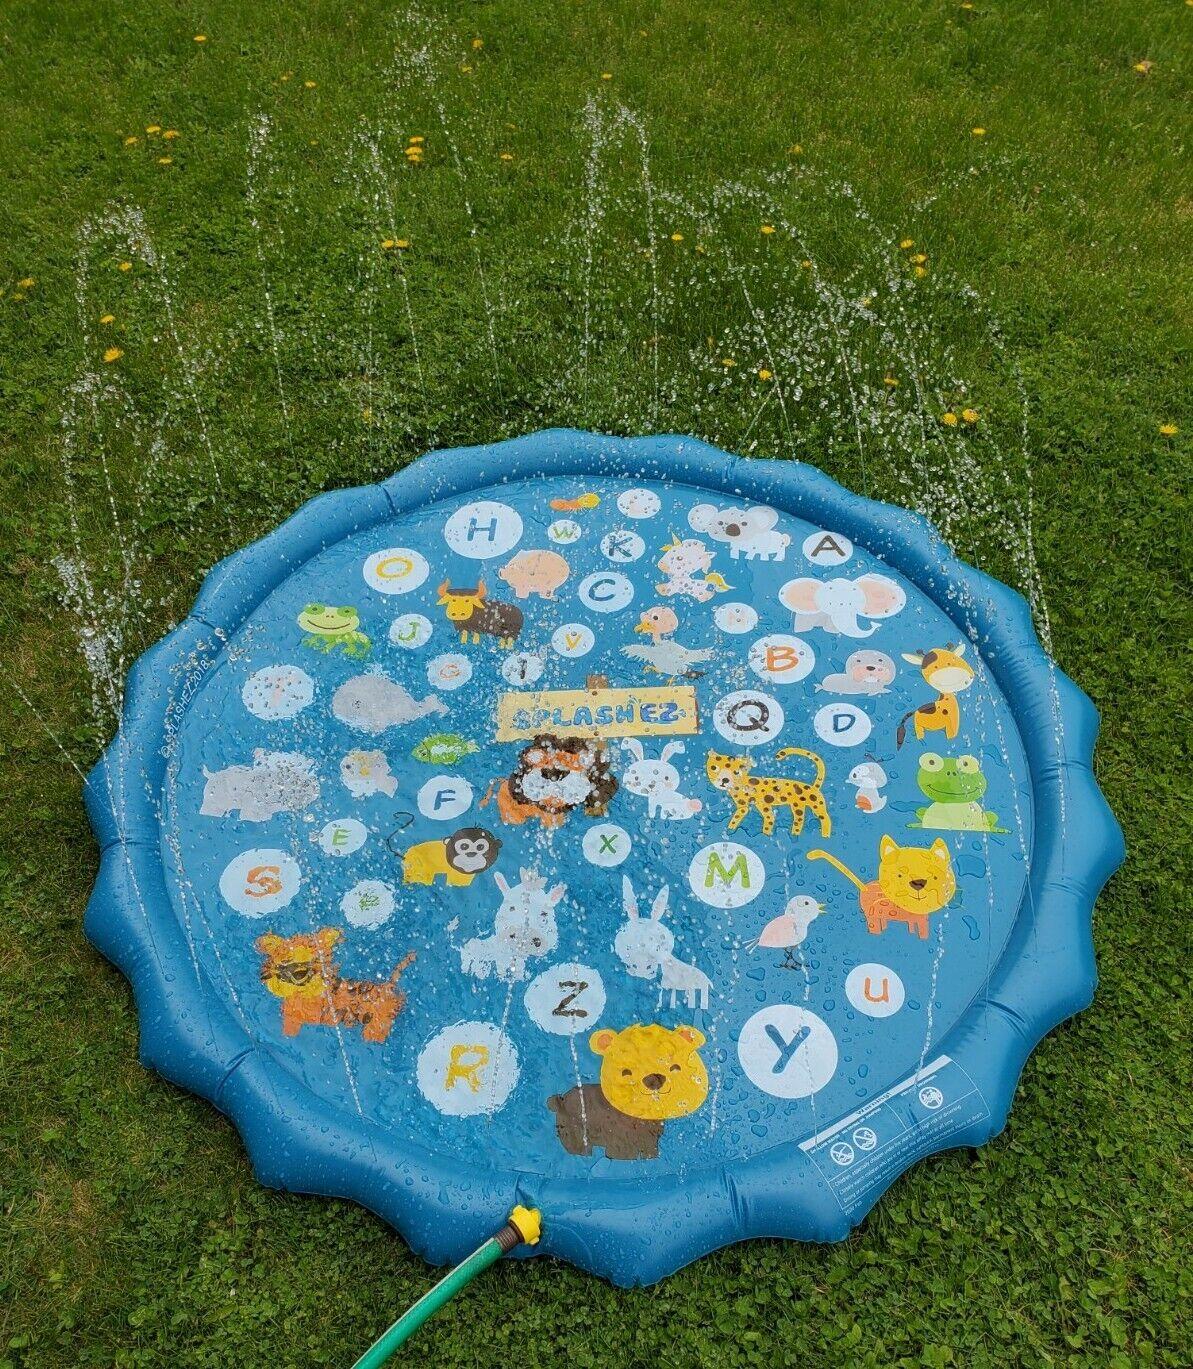 SplashEZ 3-in-1 Sprinkler for Kids and Wading Pool for Learning Splash Pad